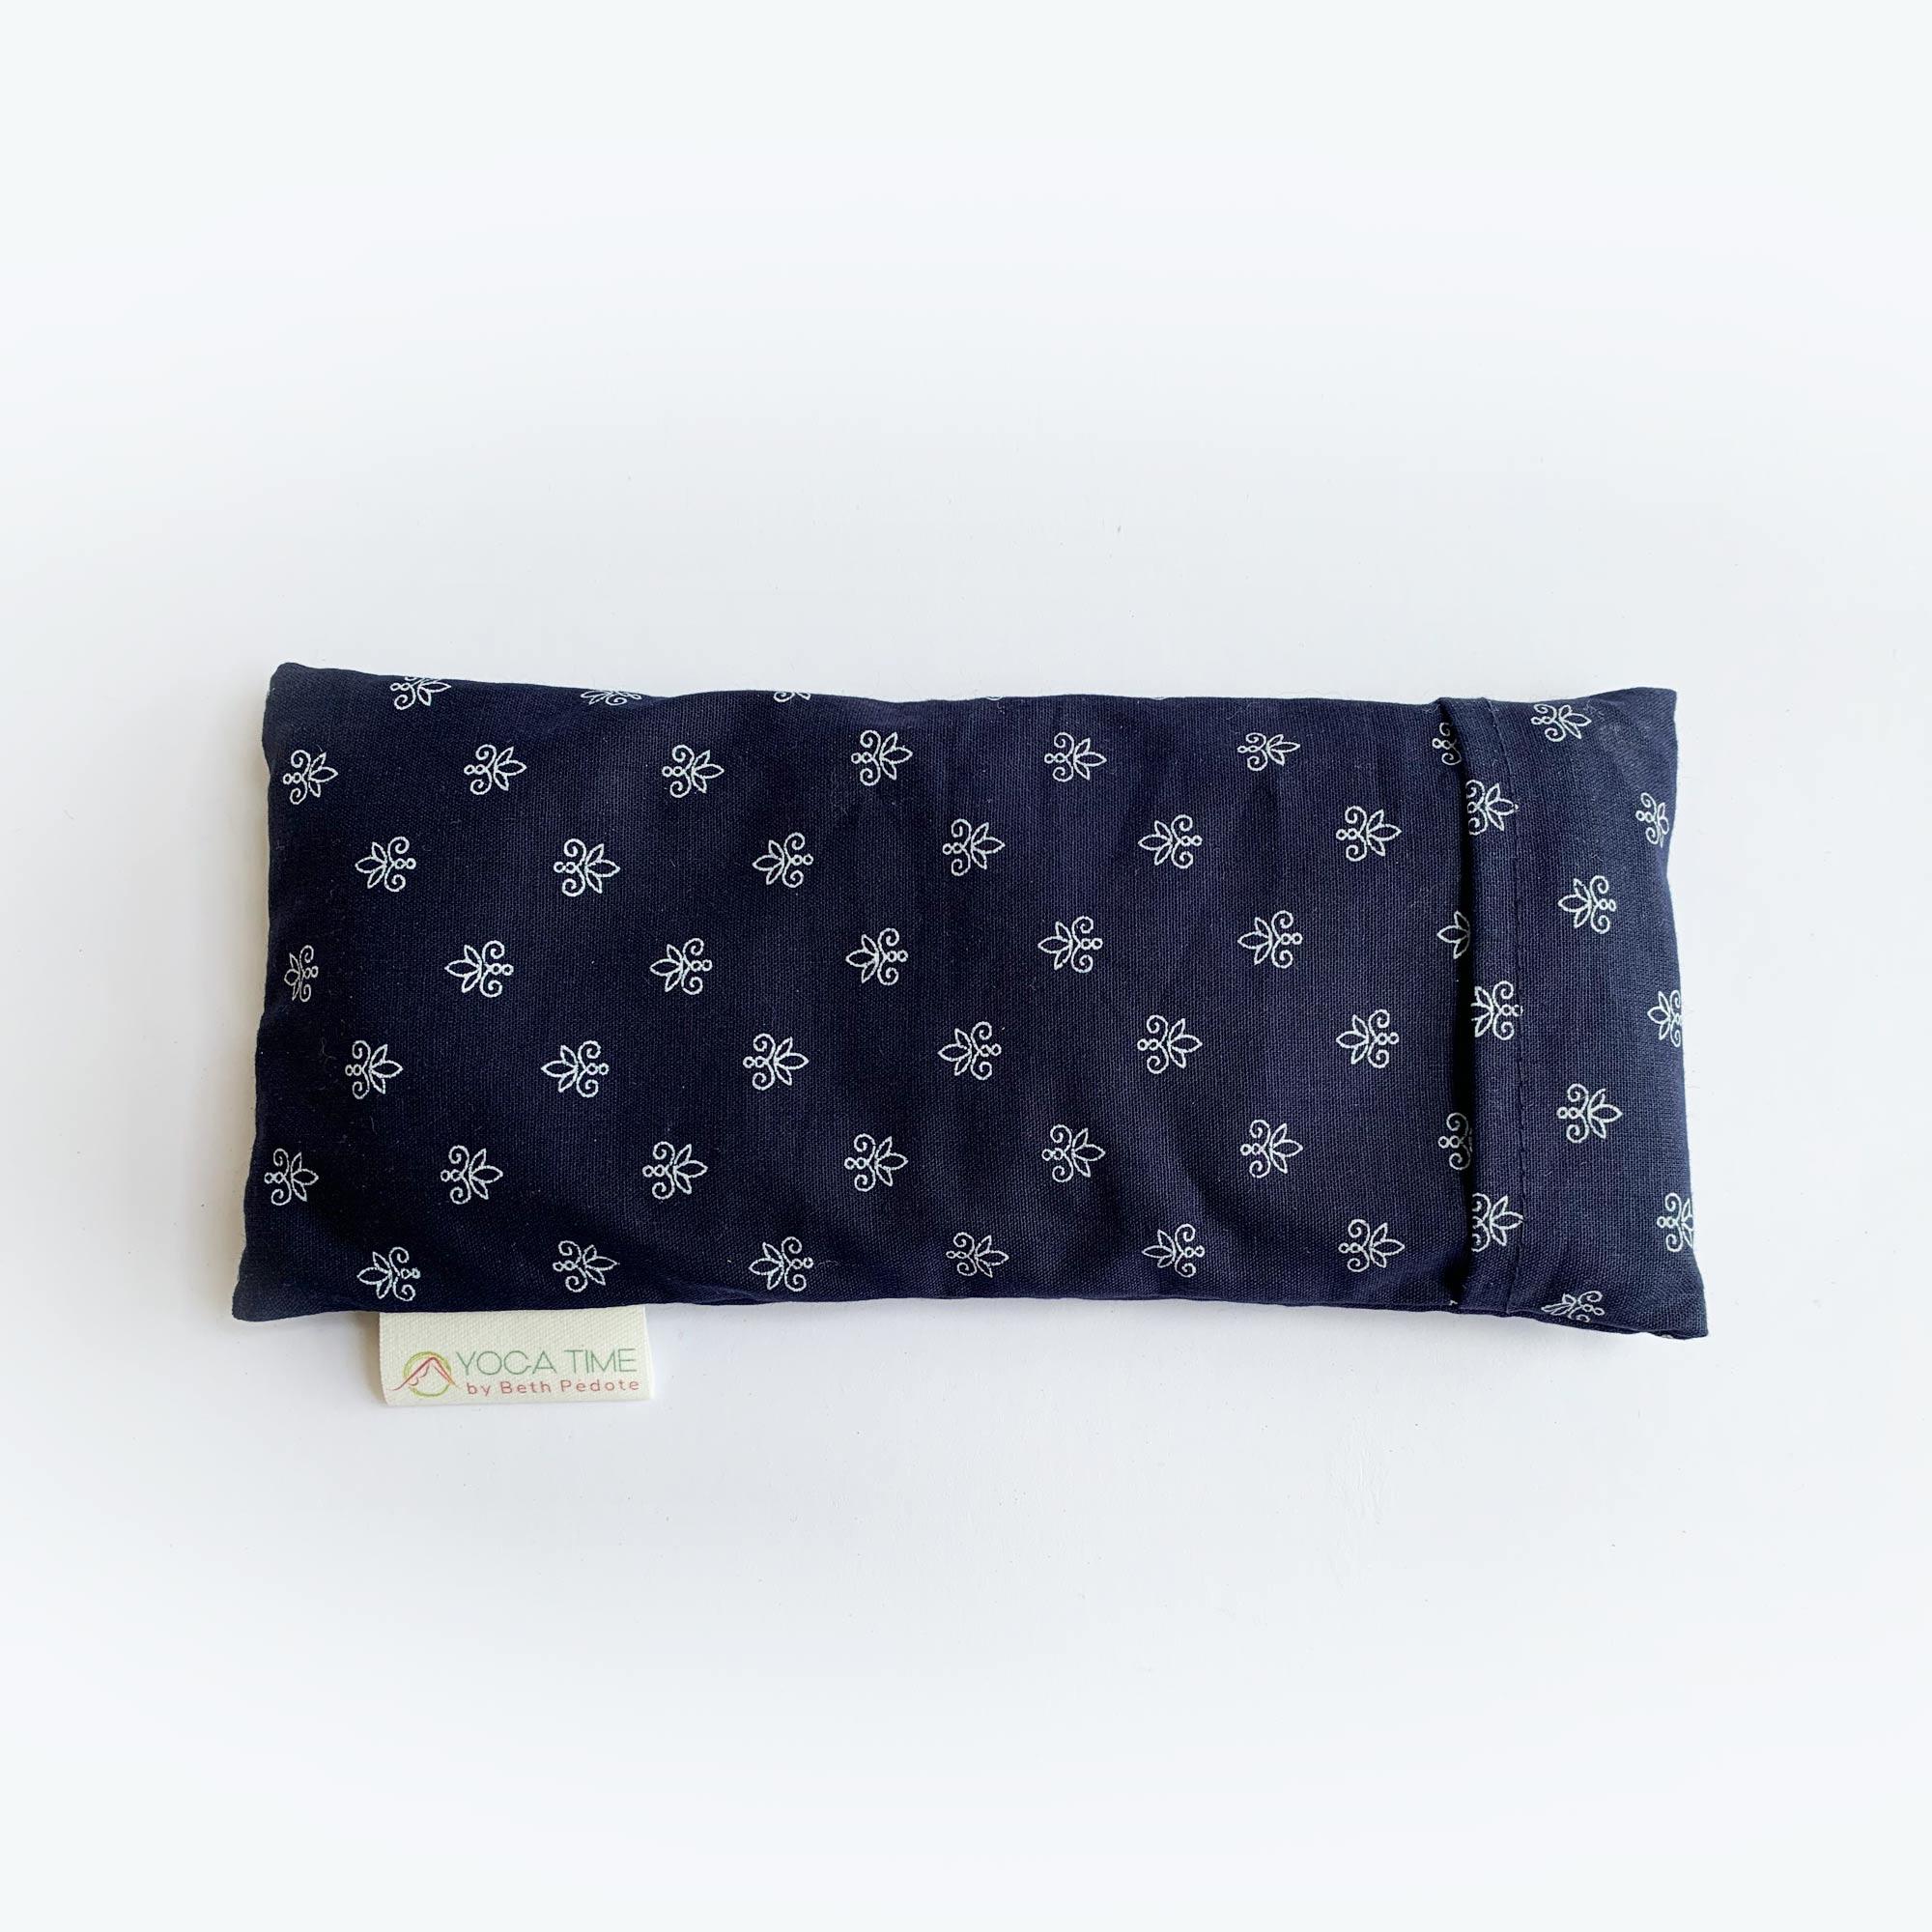 Eye Pillow Almofada Térmica para olhos LIZ